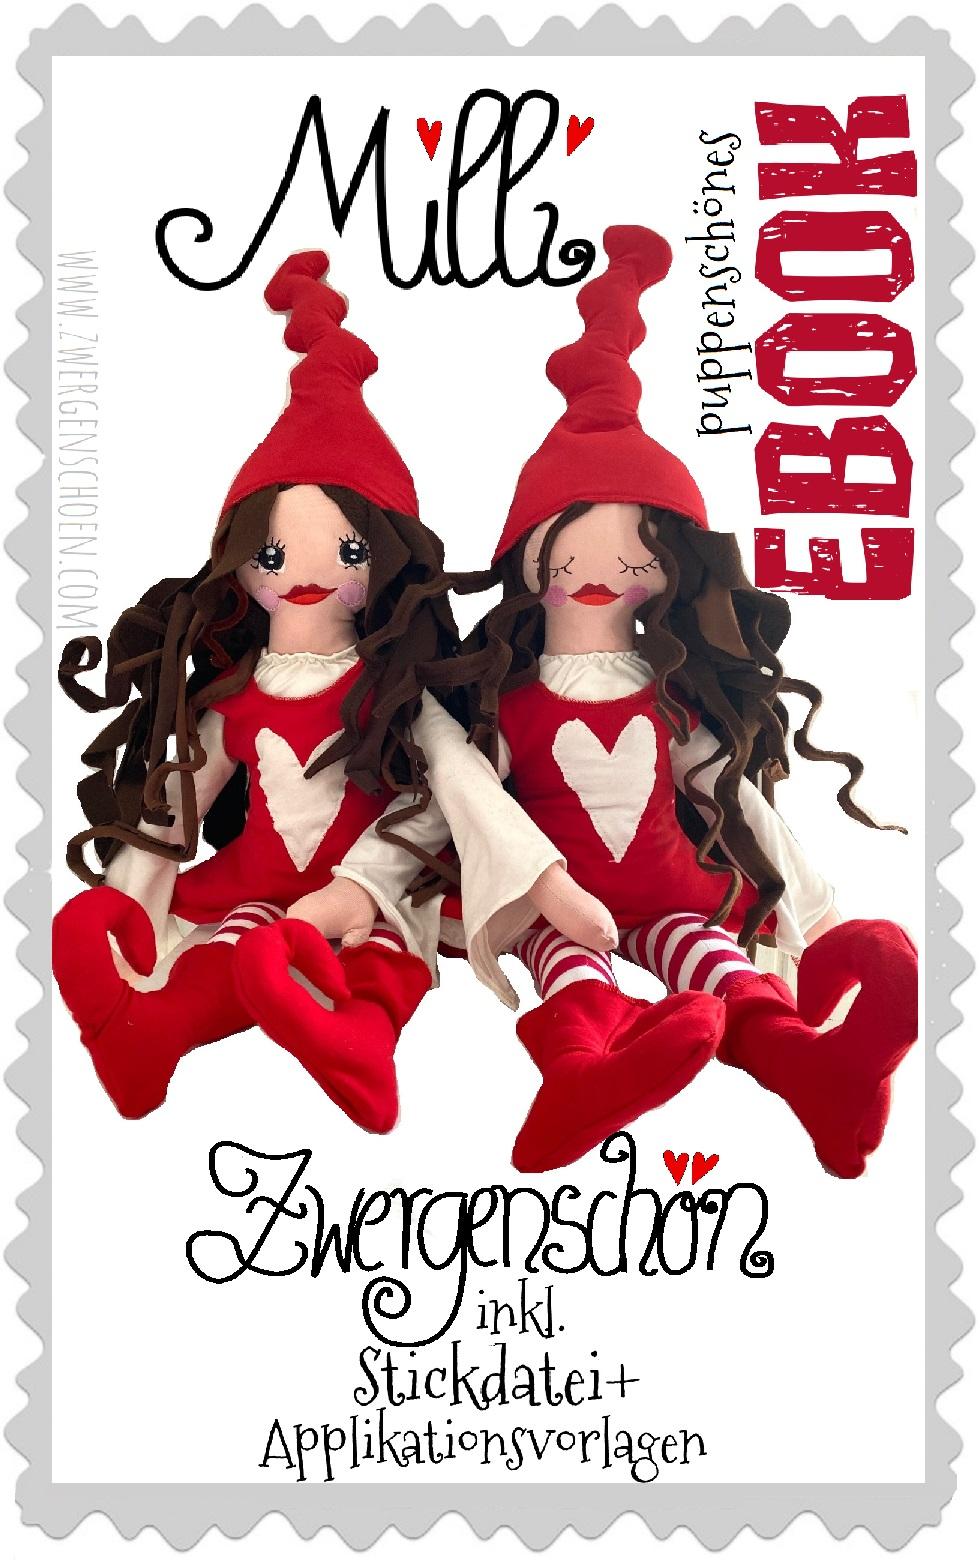 ♥MILLI ZWERGENSCHoeN♥ eBOOK decoration DOLL incl. EMBROIDERY+APPLIQUE